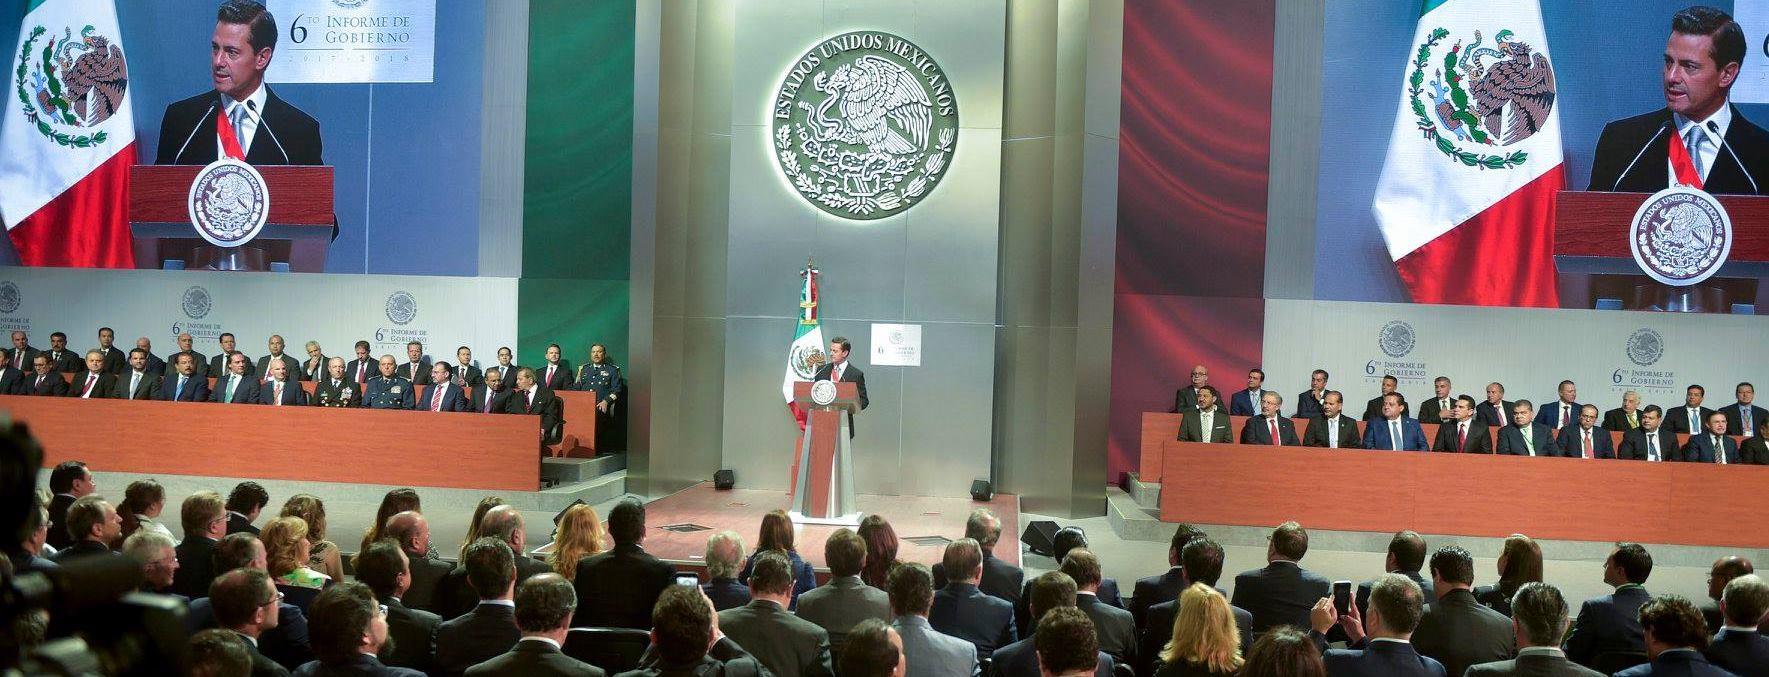 VIDEO: Enrique Pena Nieto u zadnjem predsjedničkom obraćanju pred Kongresom